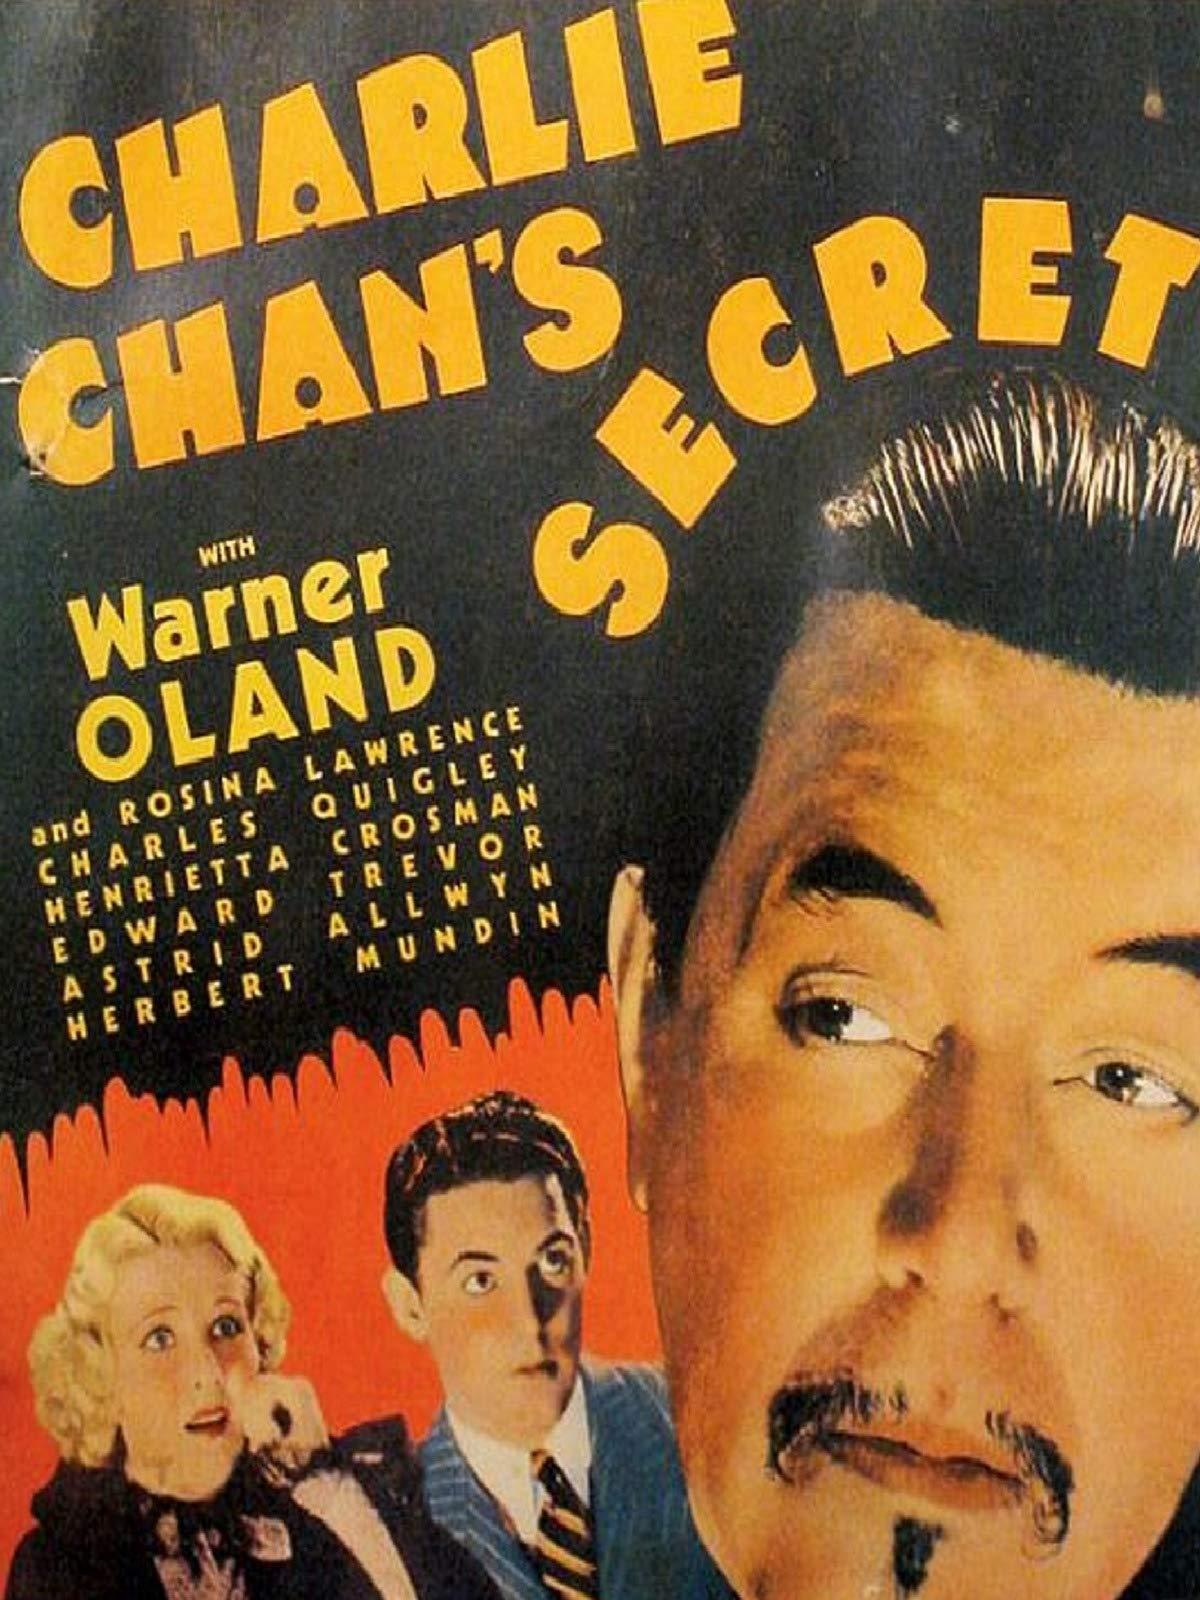 Charlie Chan : Charlie Chan's Secret